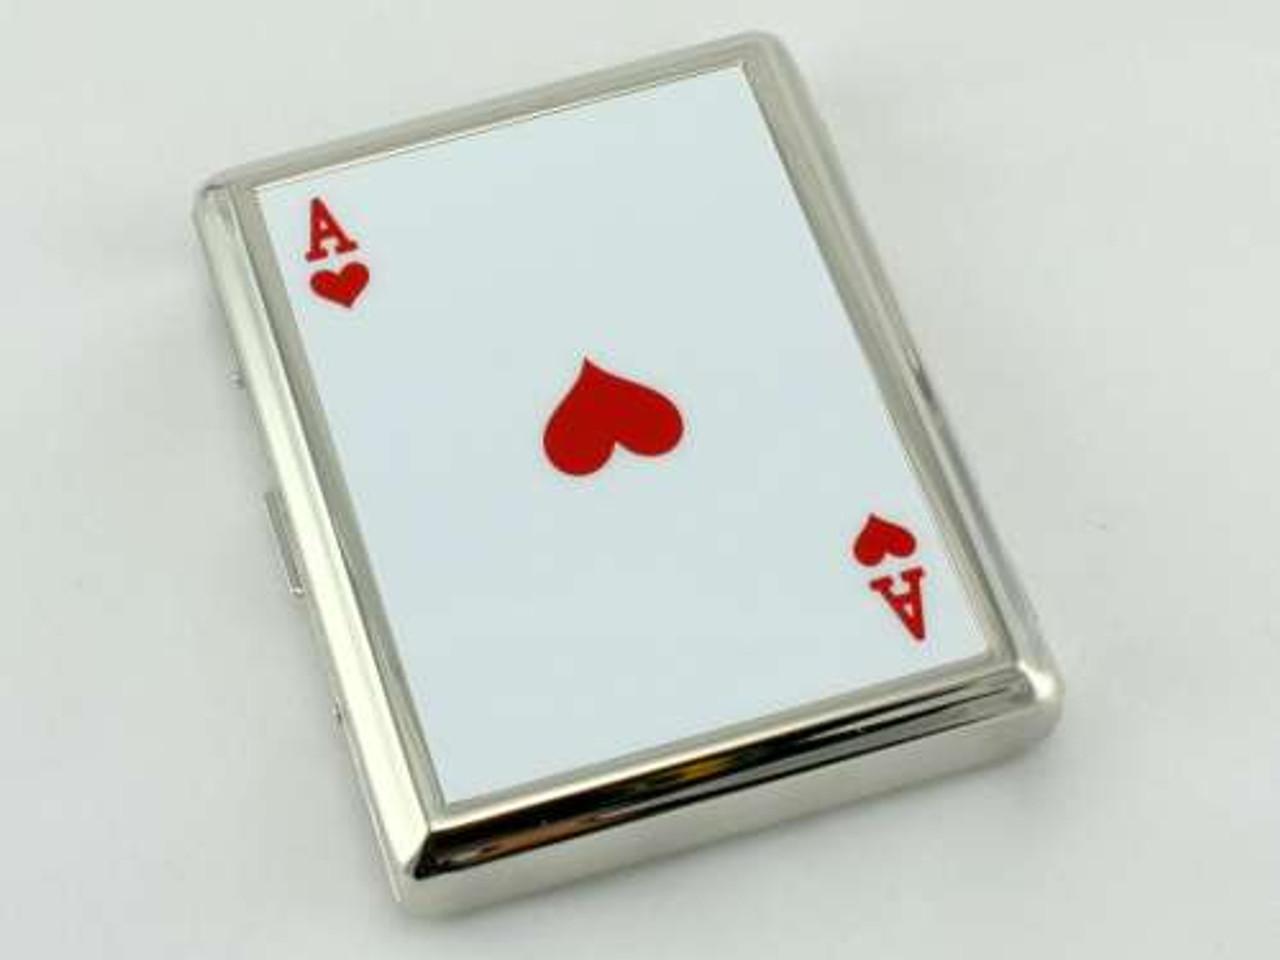 Ace of Hearts Cigarette Case